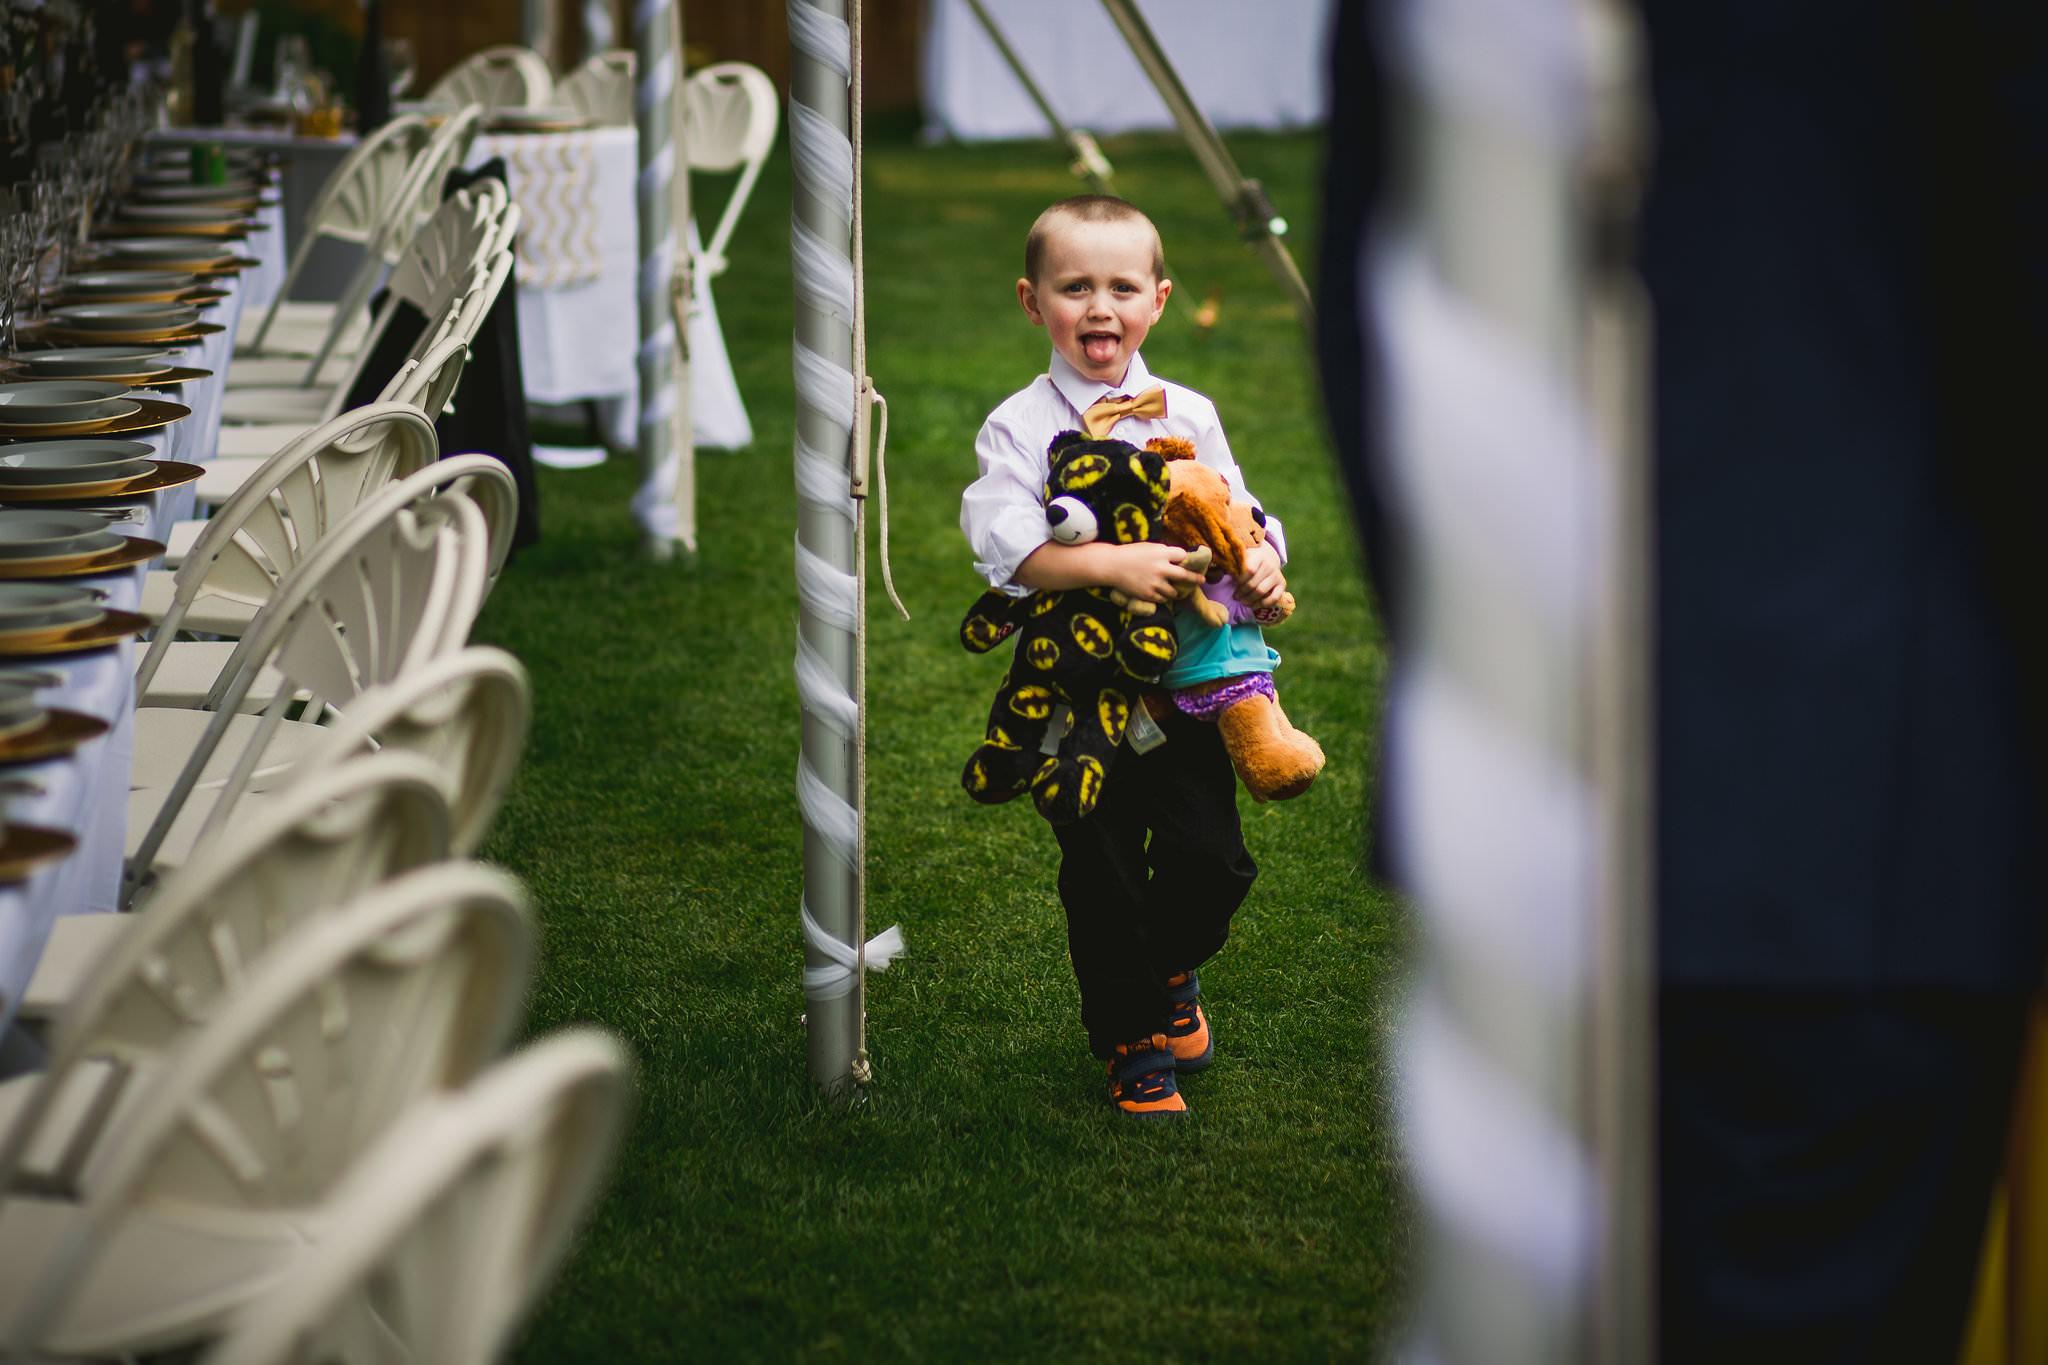 Kristen Adam Kindred Loft Whitby Wedding Photos 120 - Durham Wedding Photographer: Kindred Loft Wedding Photos